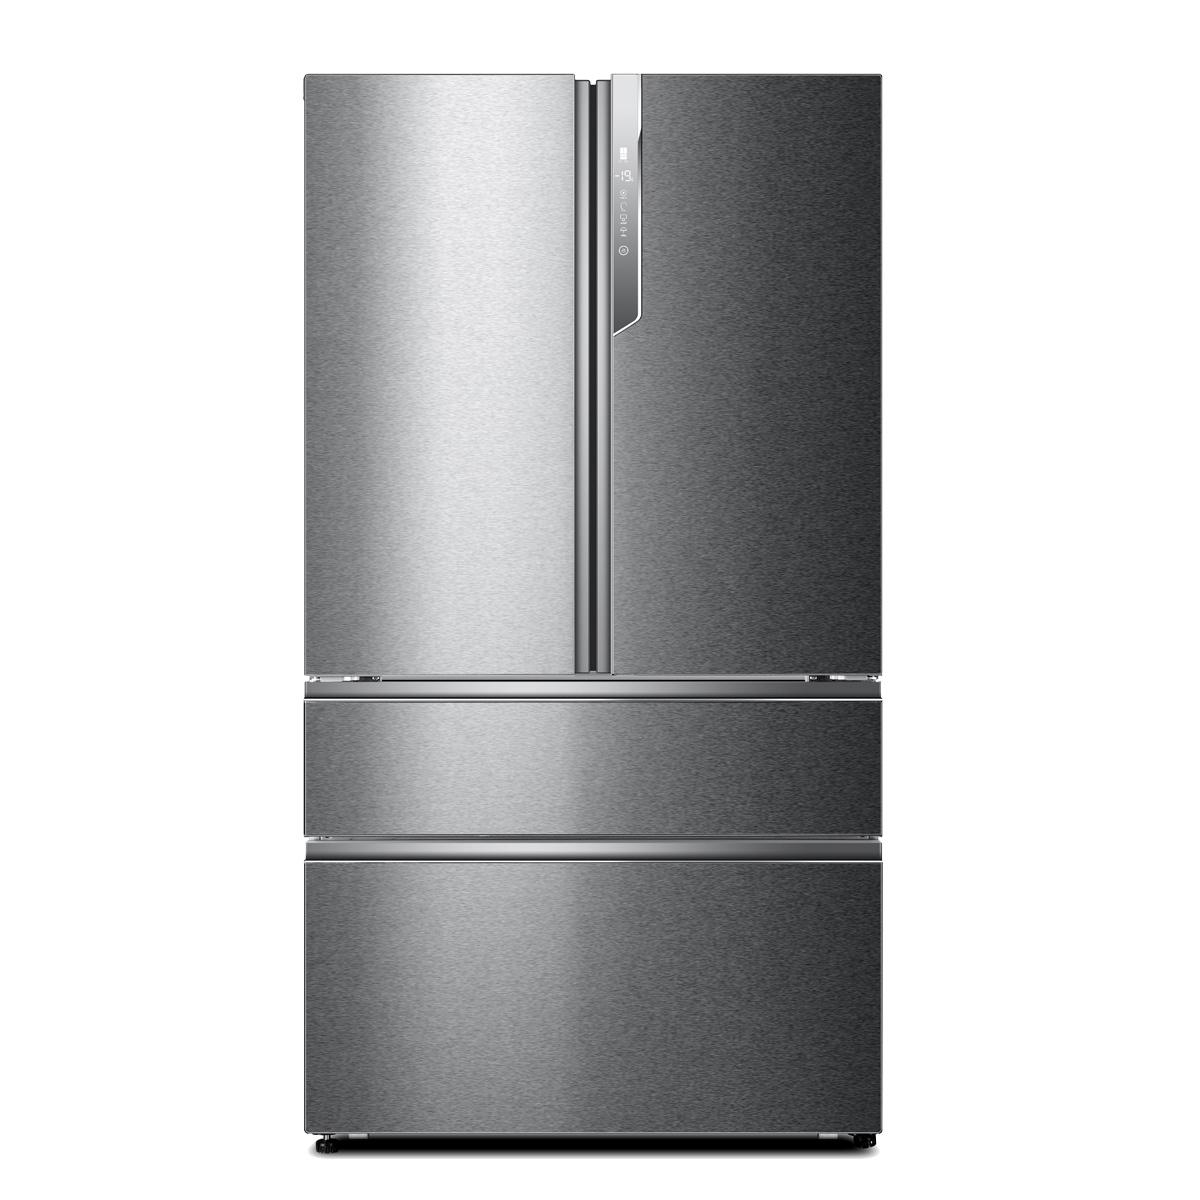 refrigerateur grande largeur pas cher. Black Bedroom Furniture Sets. Home Design Ideas